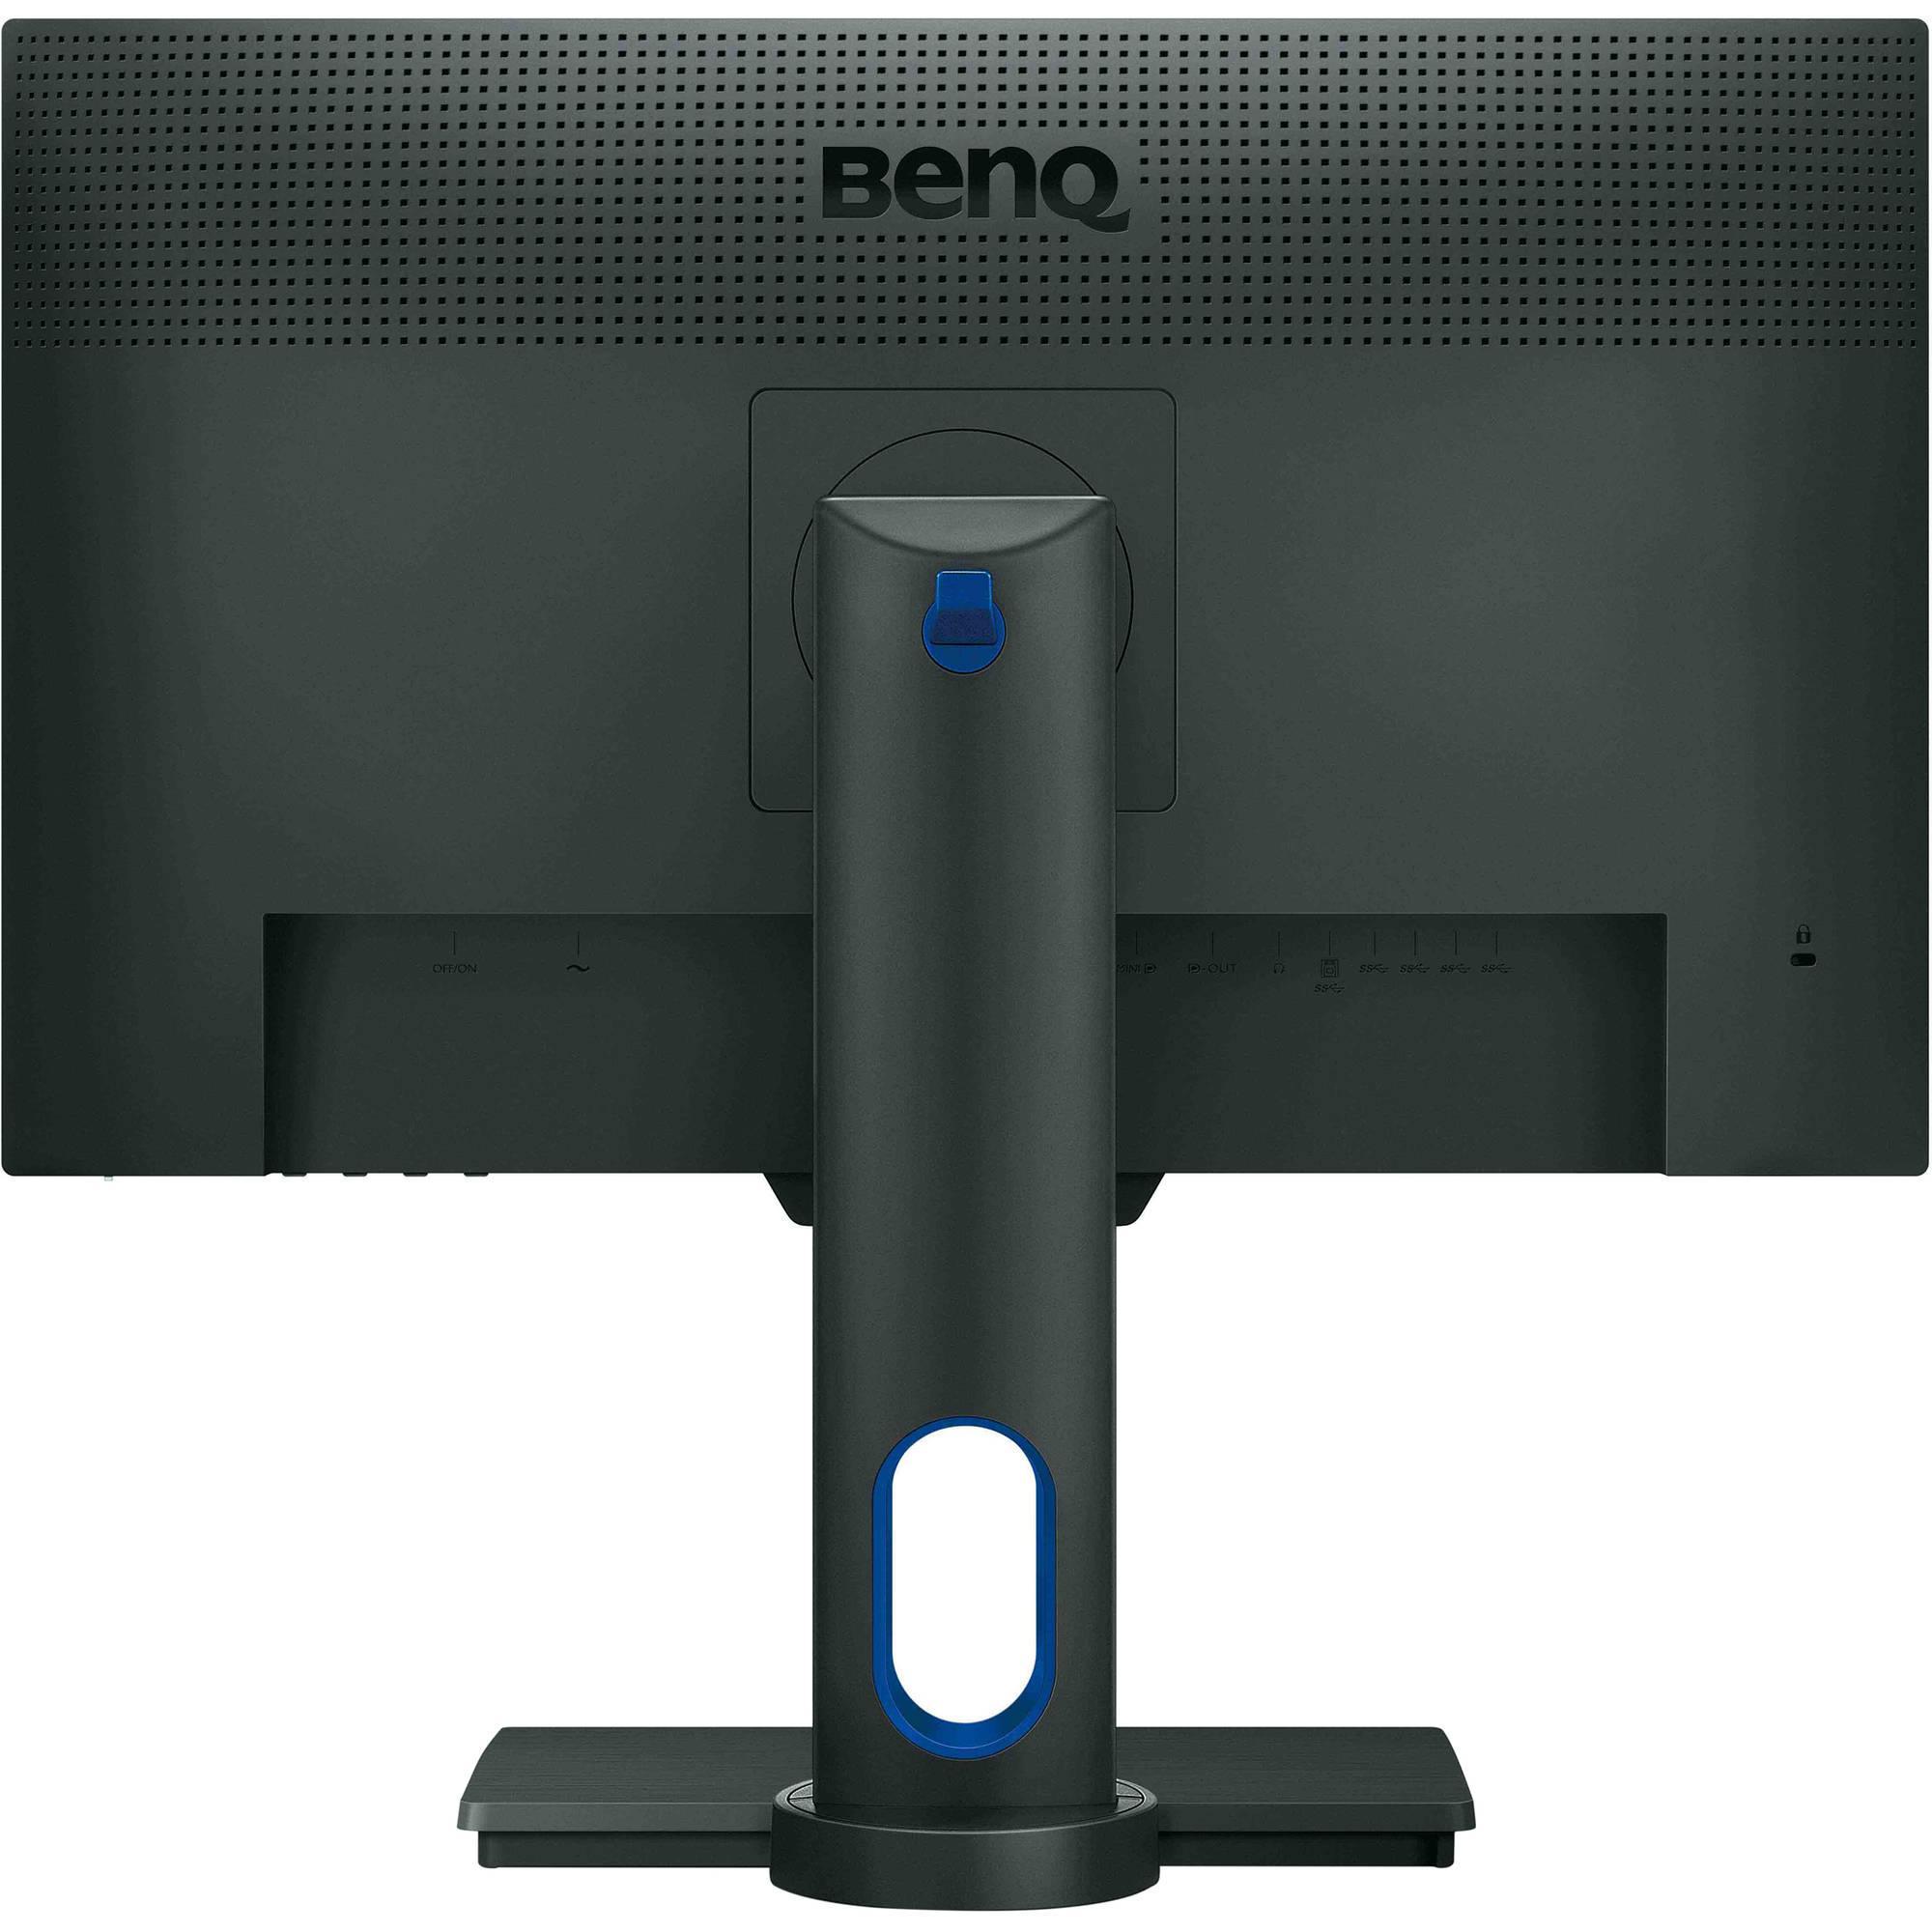 Benq 25-inch Monitor 2560 x 1440 QHD (PD2500Q)